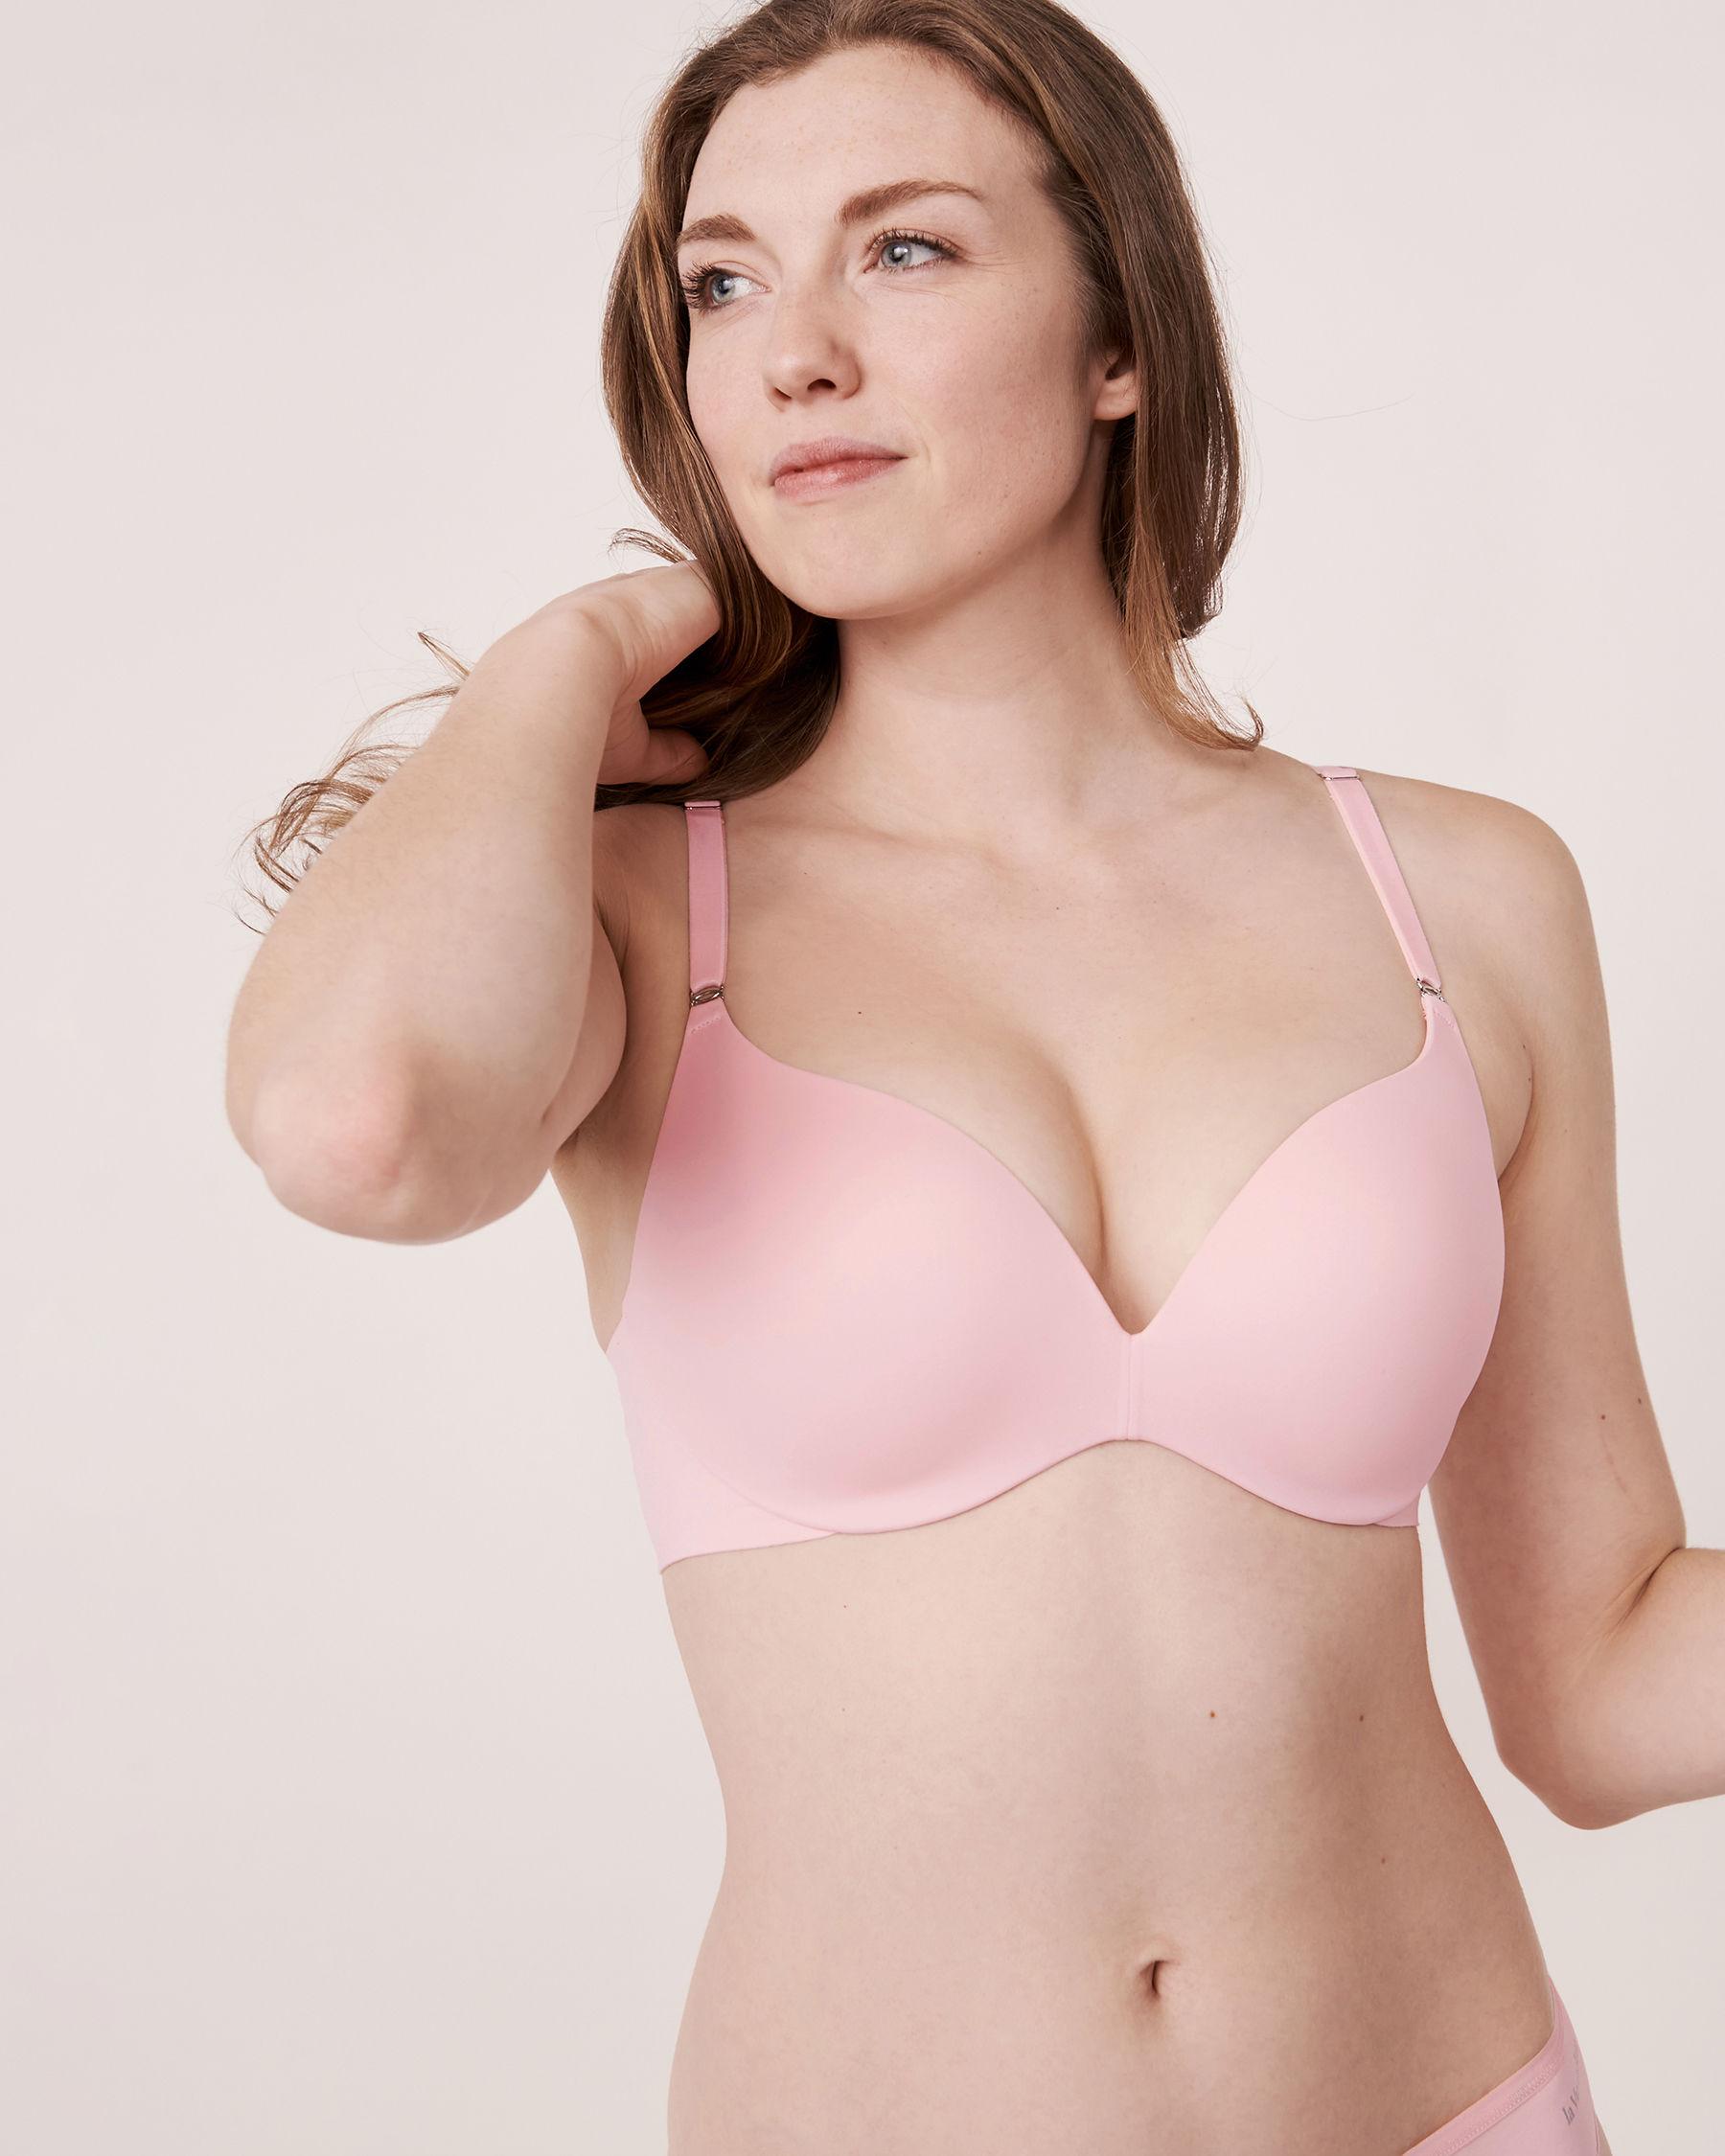 LA VIE EN ROSE Push-up Wireless Sleek Back Bra Pink 10300014 - View1